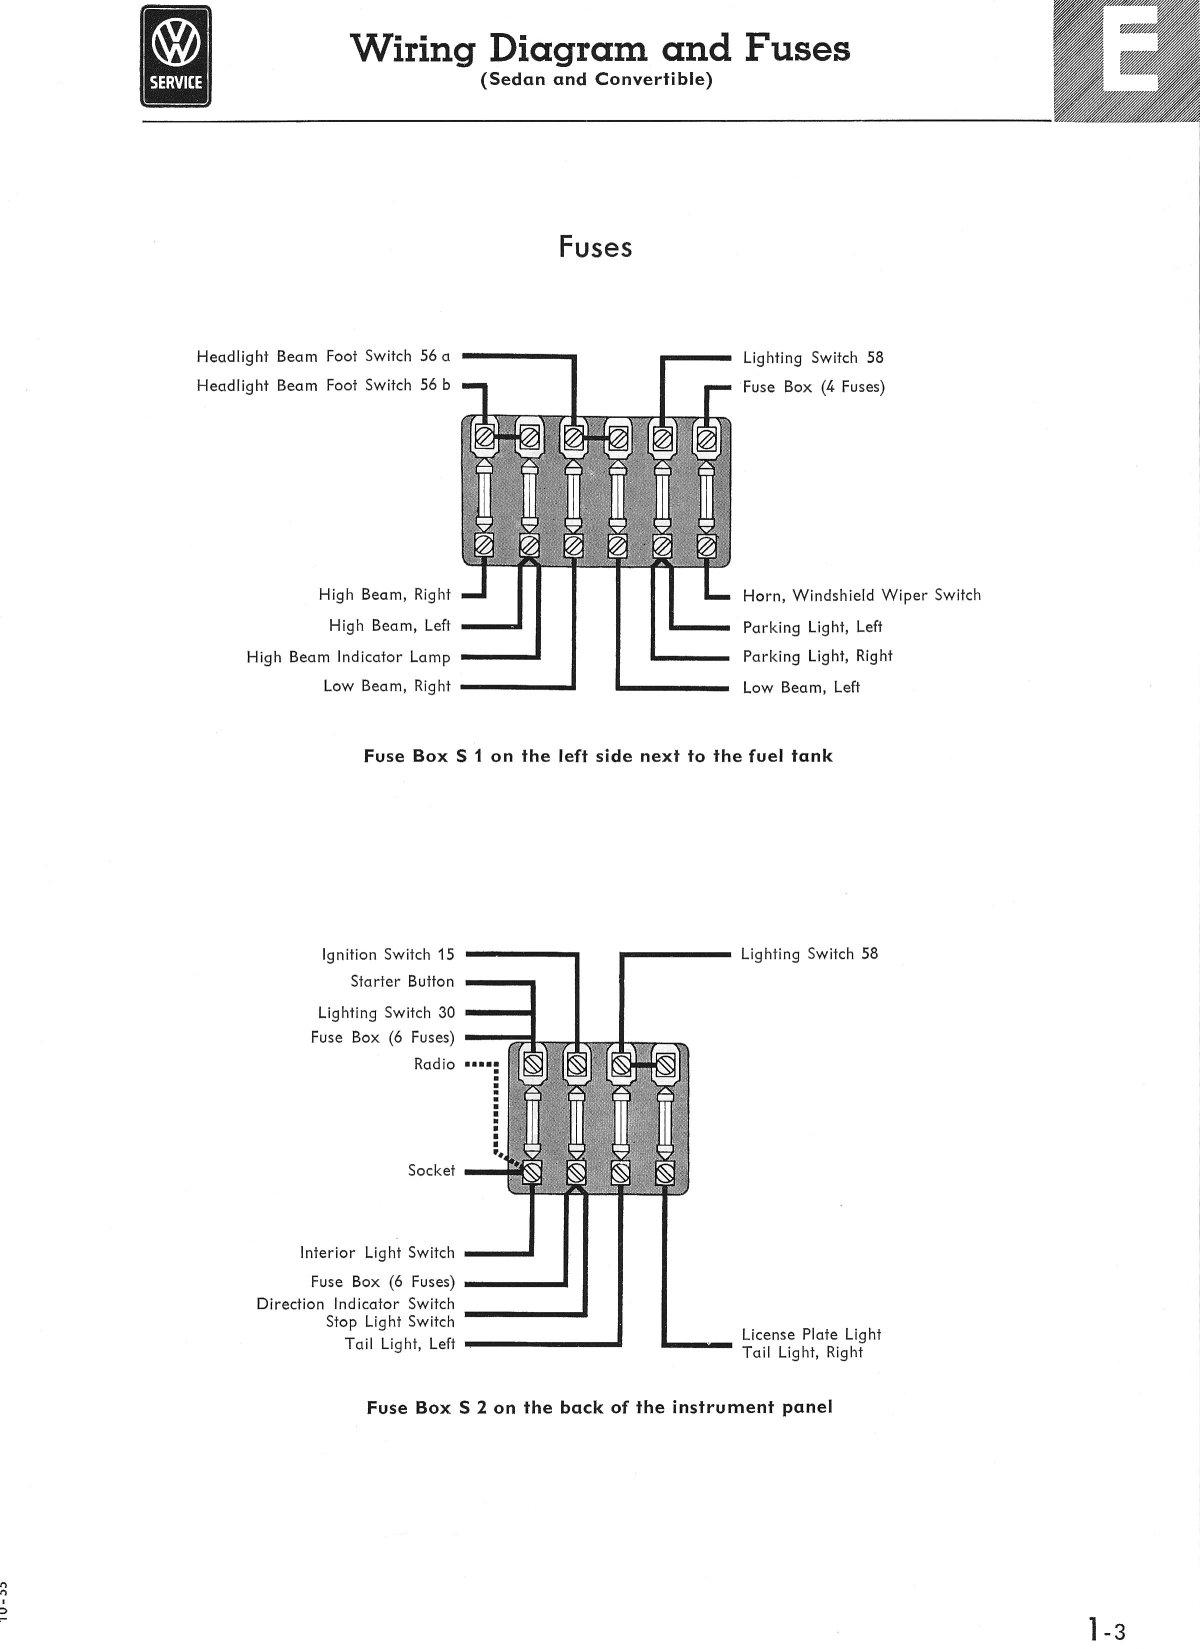 2003 Ford Windstar Lx Fuse Box Diagram  Diagram Honda Fuse